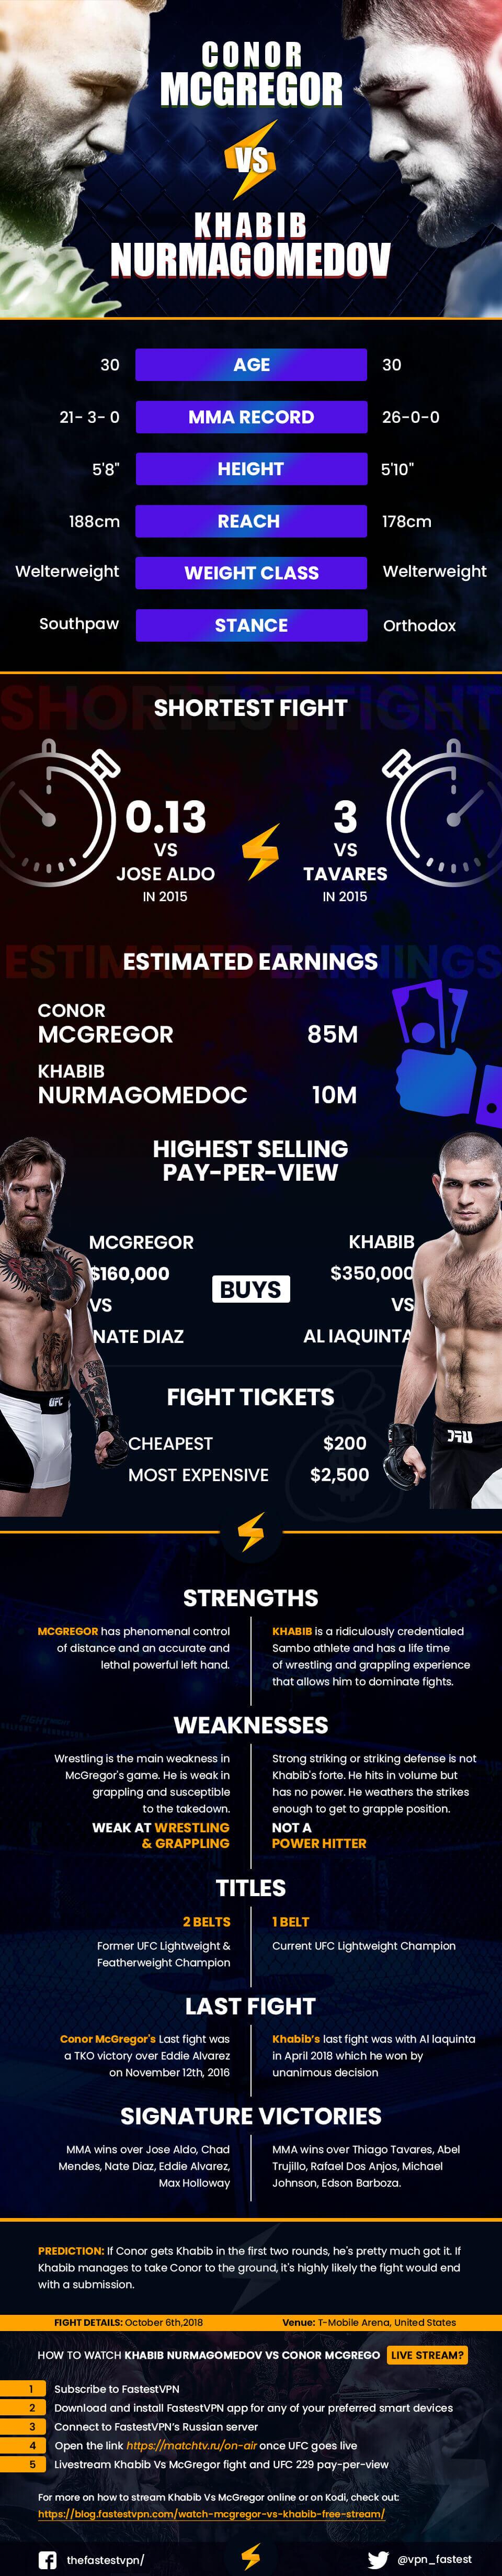 mcgregor vs khabib fight